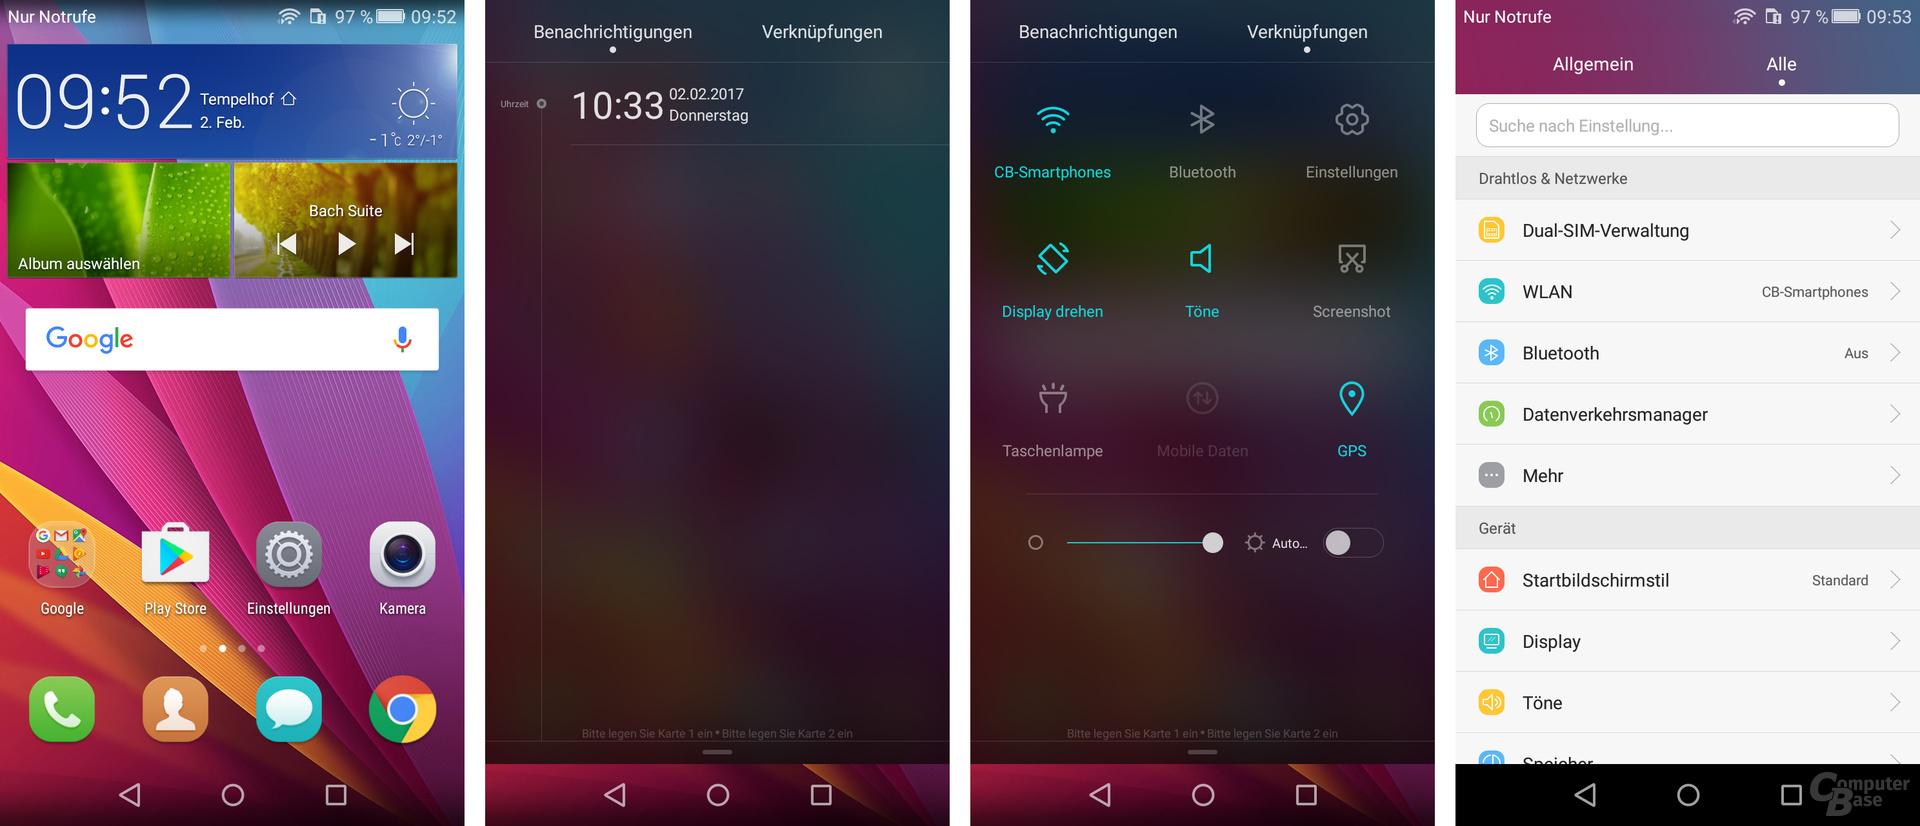 Huawei Y6 II Compact: Vollständig überarbeitetes Android